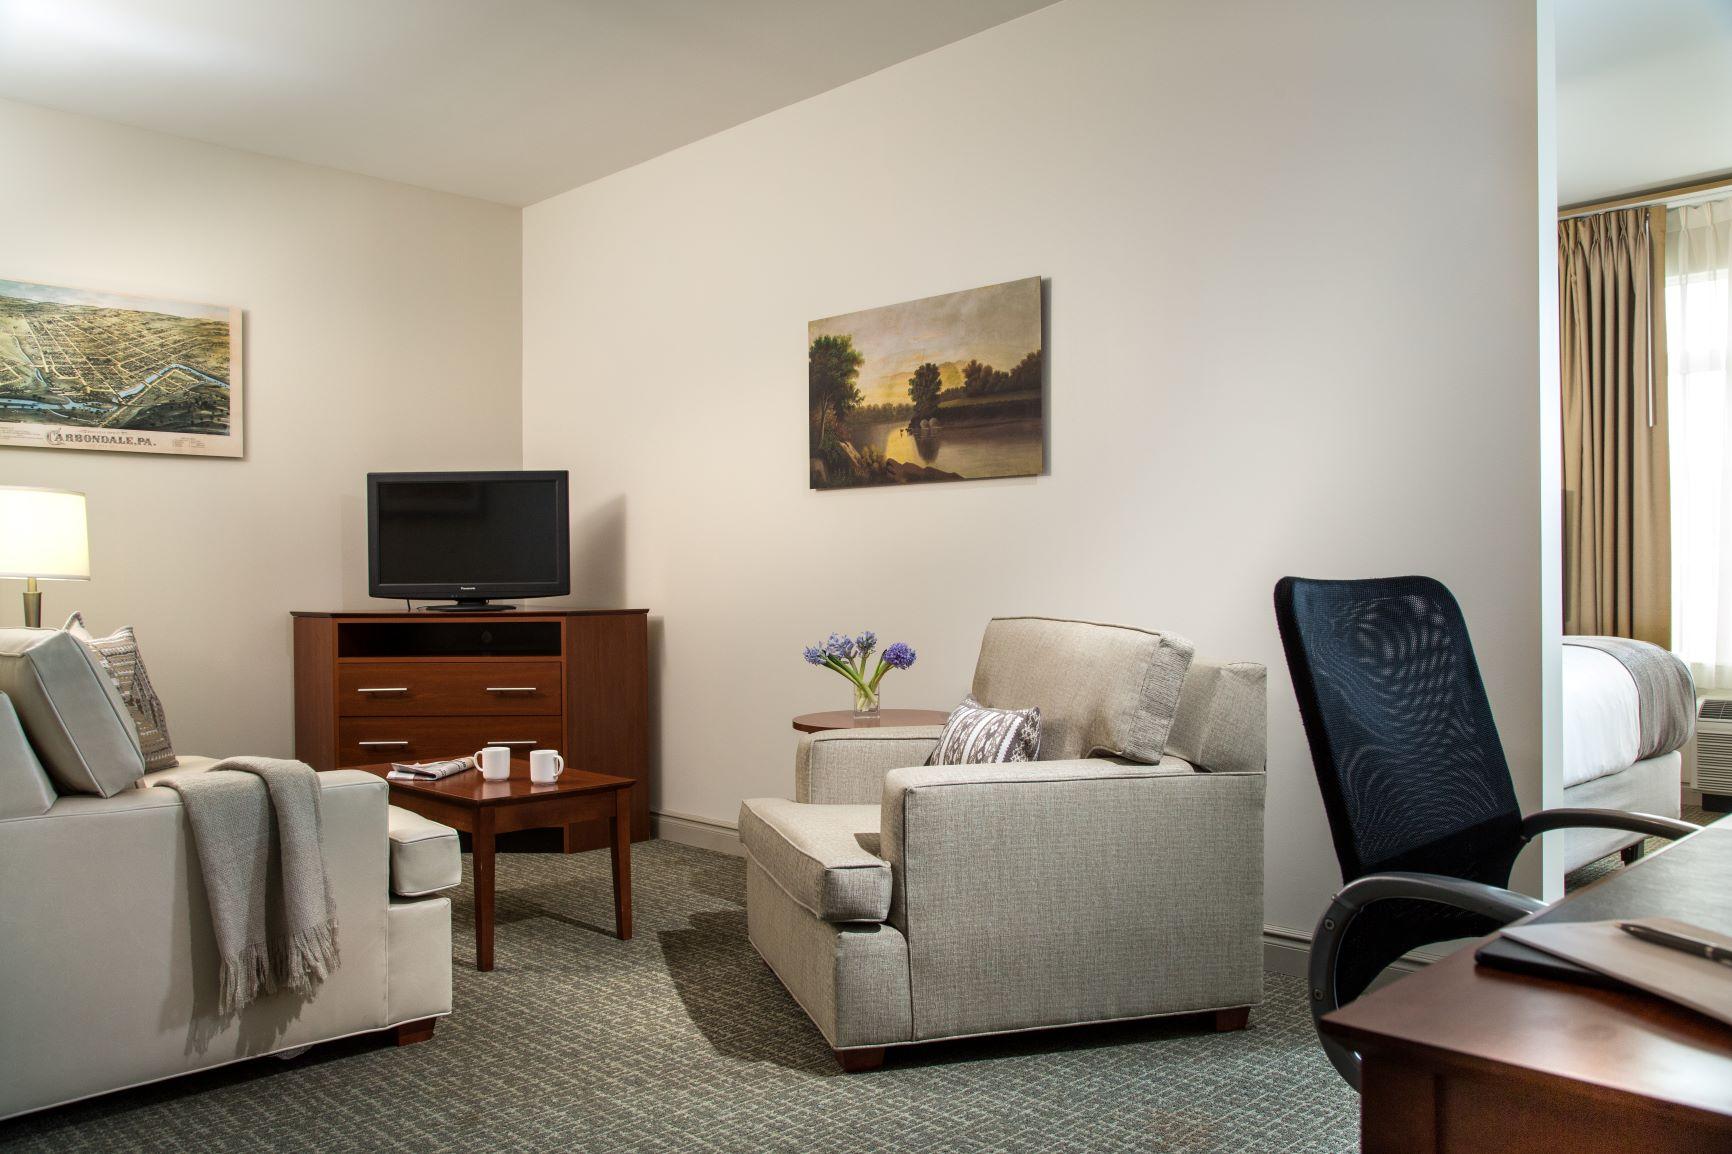 Hotel-Anthracite-Rooms-Queen-Suite-1 - Hotel Anthracite